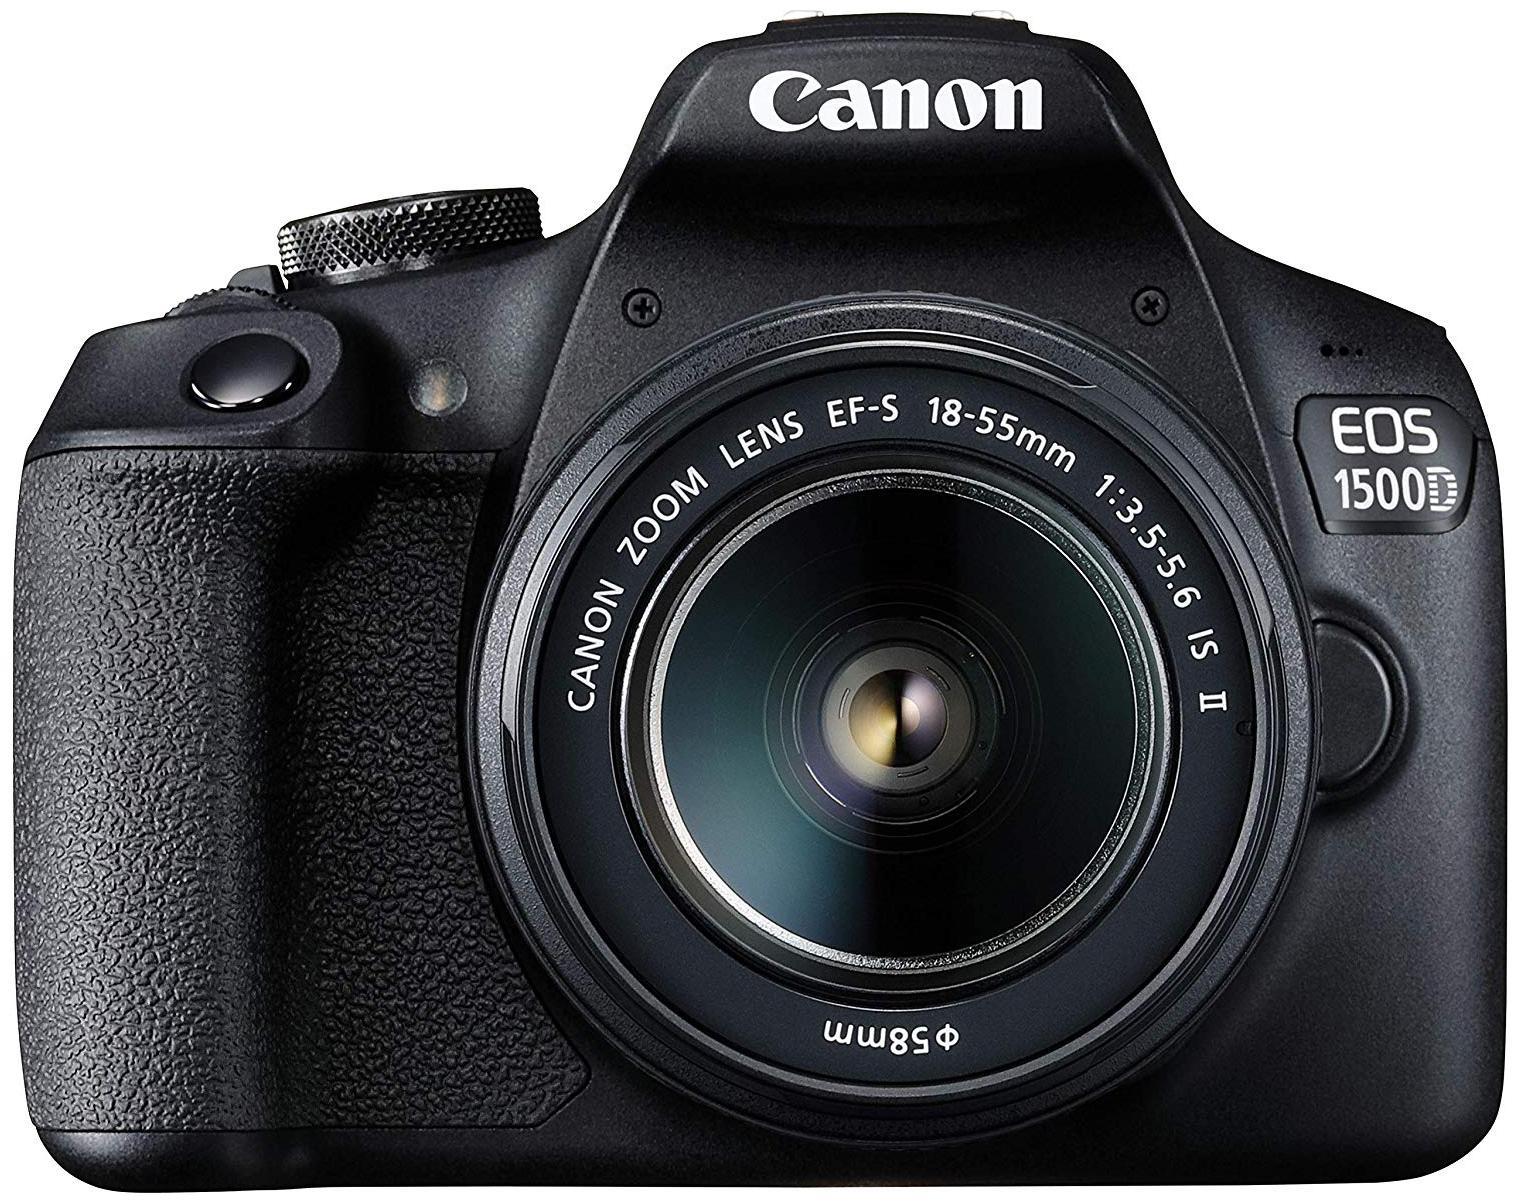 Canon EOS 1500D Kit  EF S18 55 IS II  24.1 MP DSLR Camera  Black